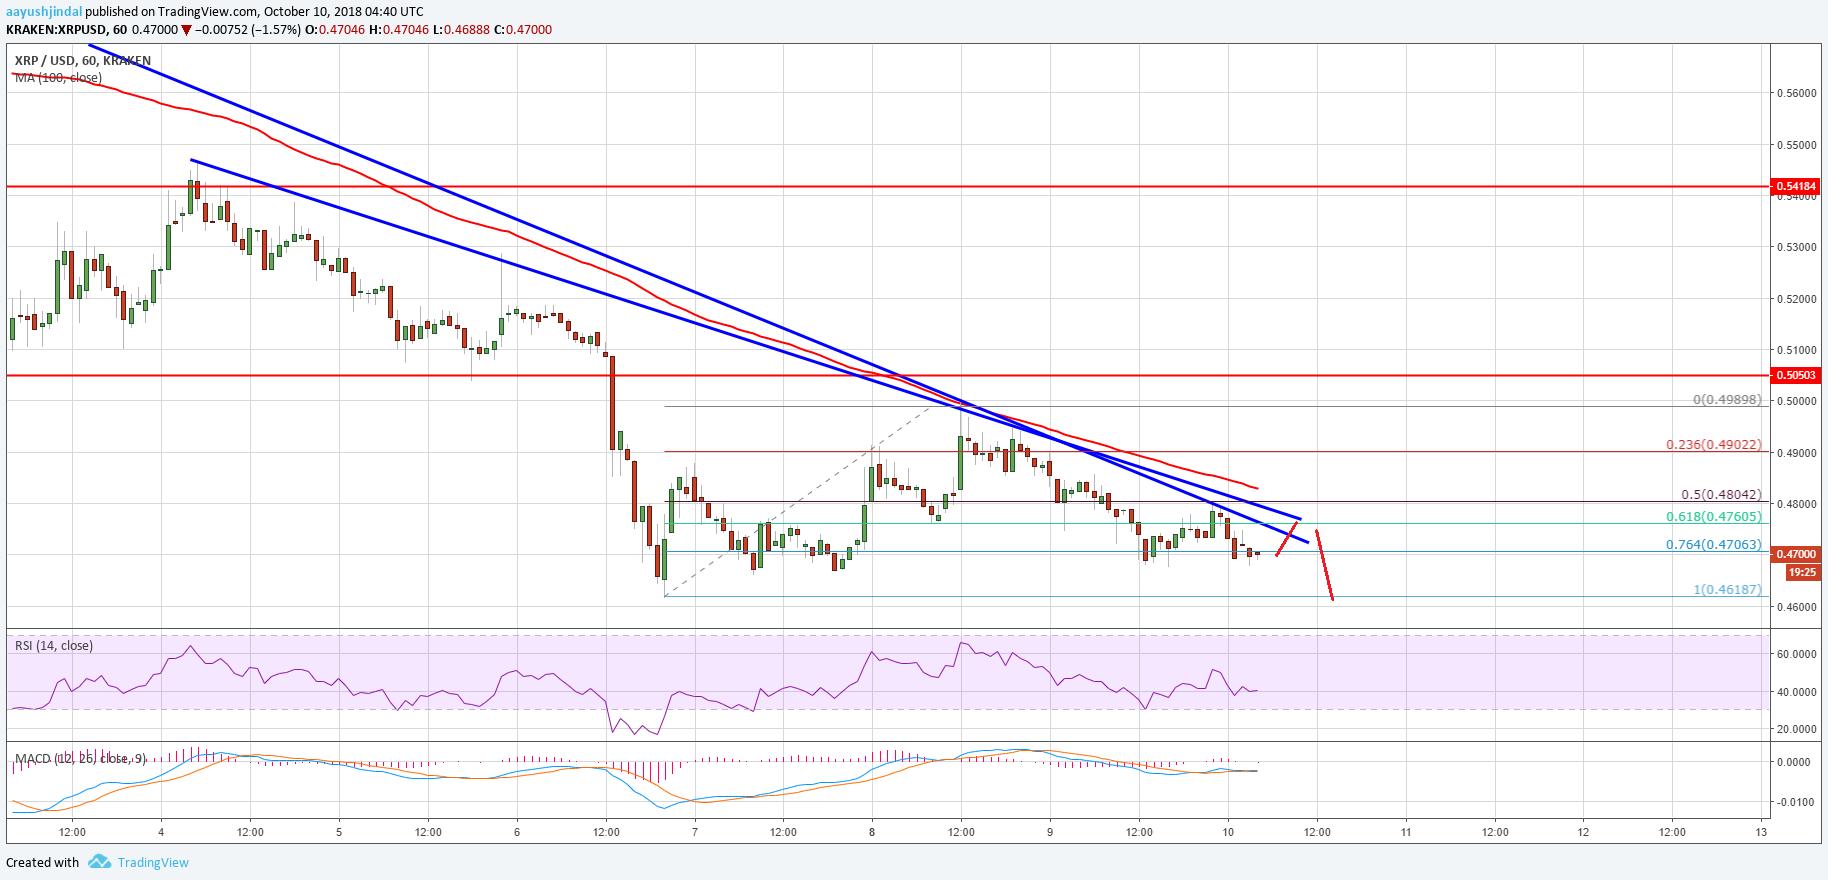 Ripple Price Analysis: XRP/USD Extending Losses Below $0.4800 1